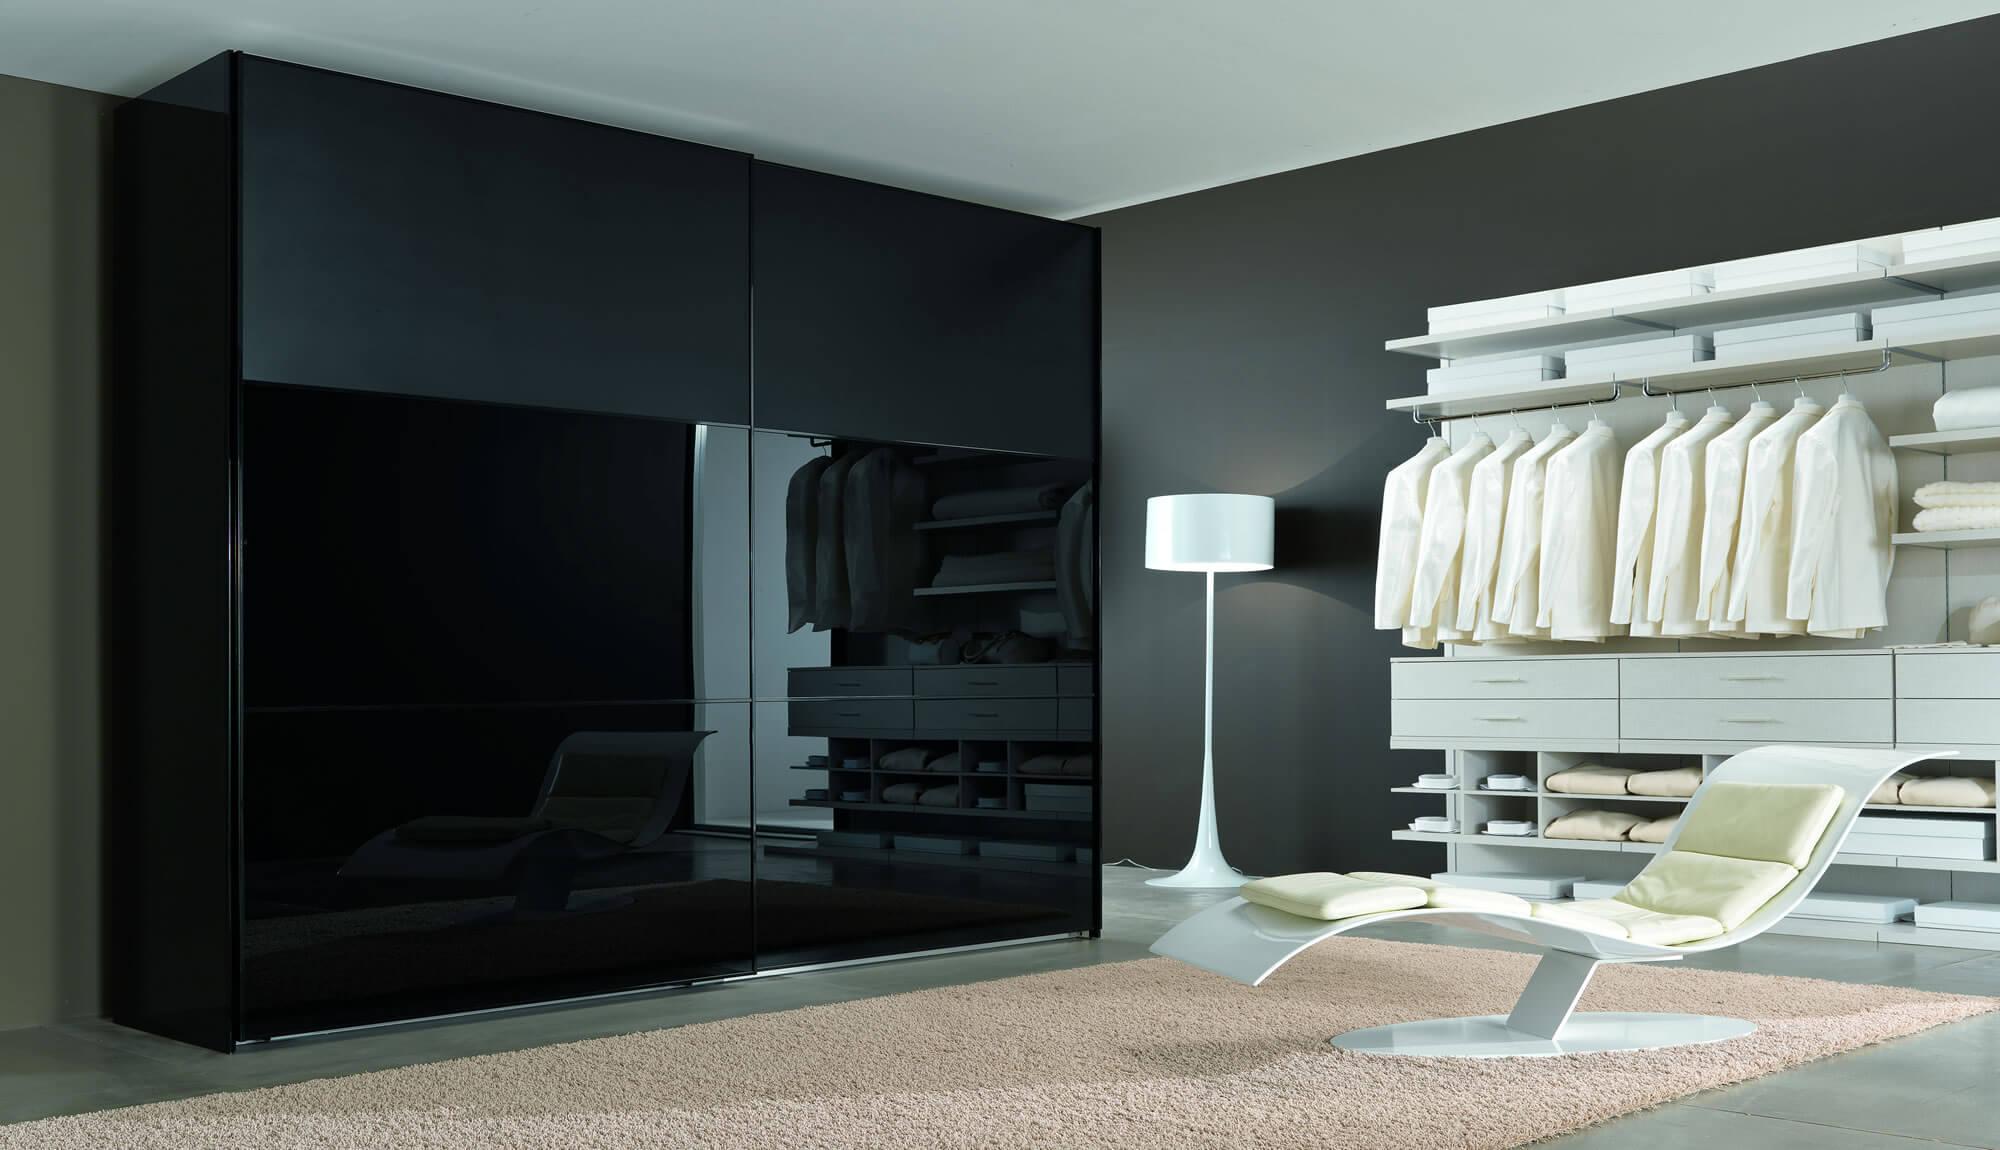 Dressing negru mobilier dressing la comanda bucuresti for Model de dressing